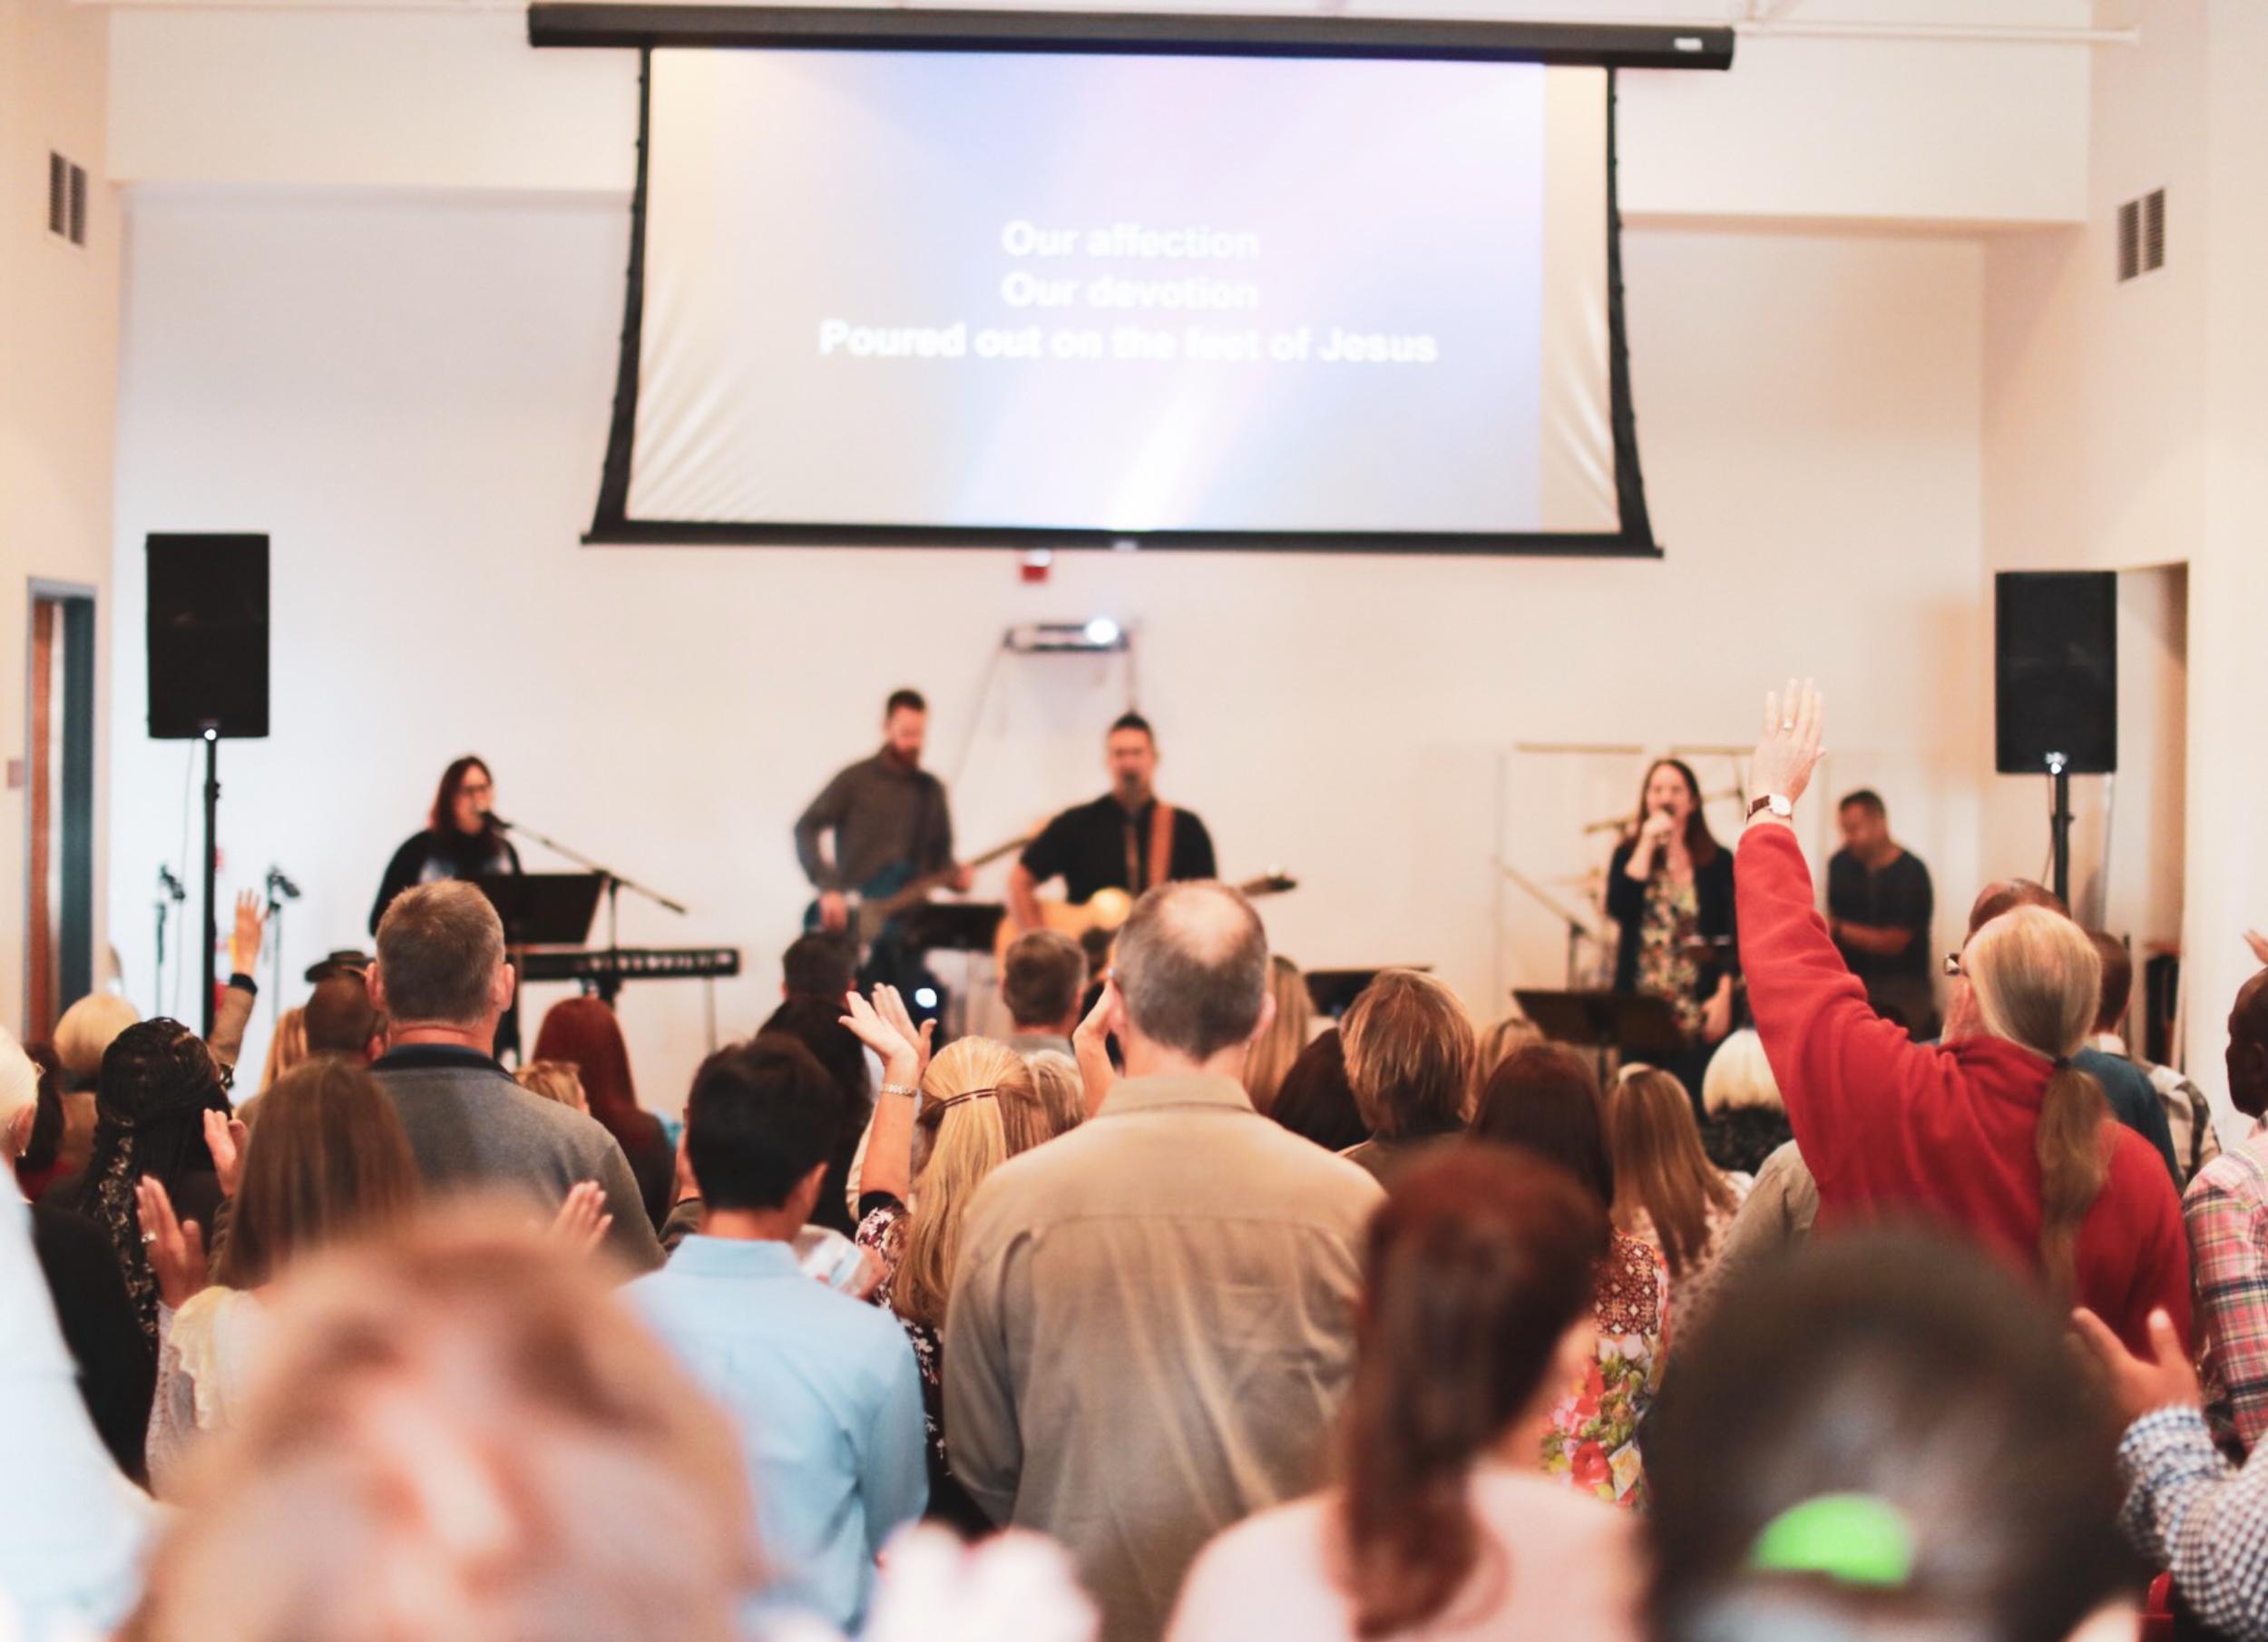 Worship at The Bridge during a Sunday Service